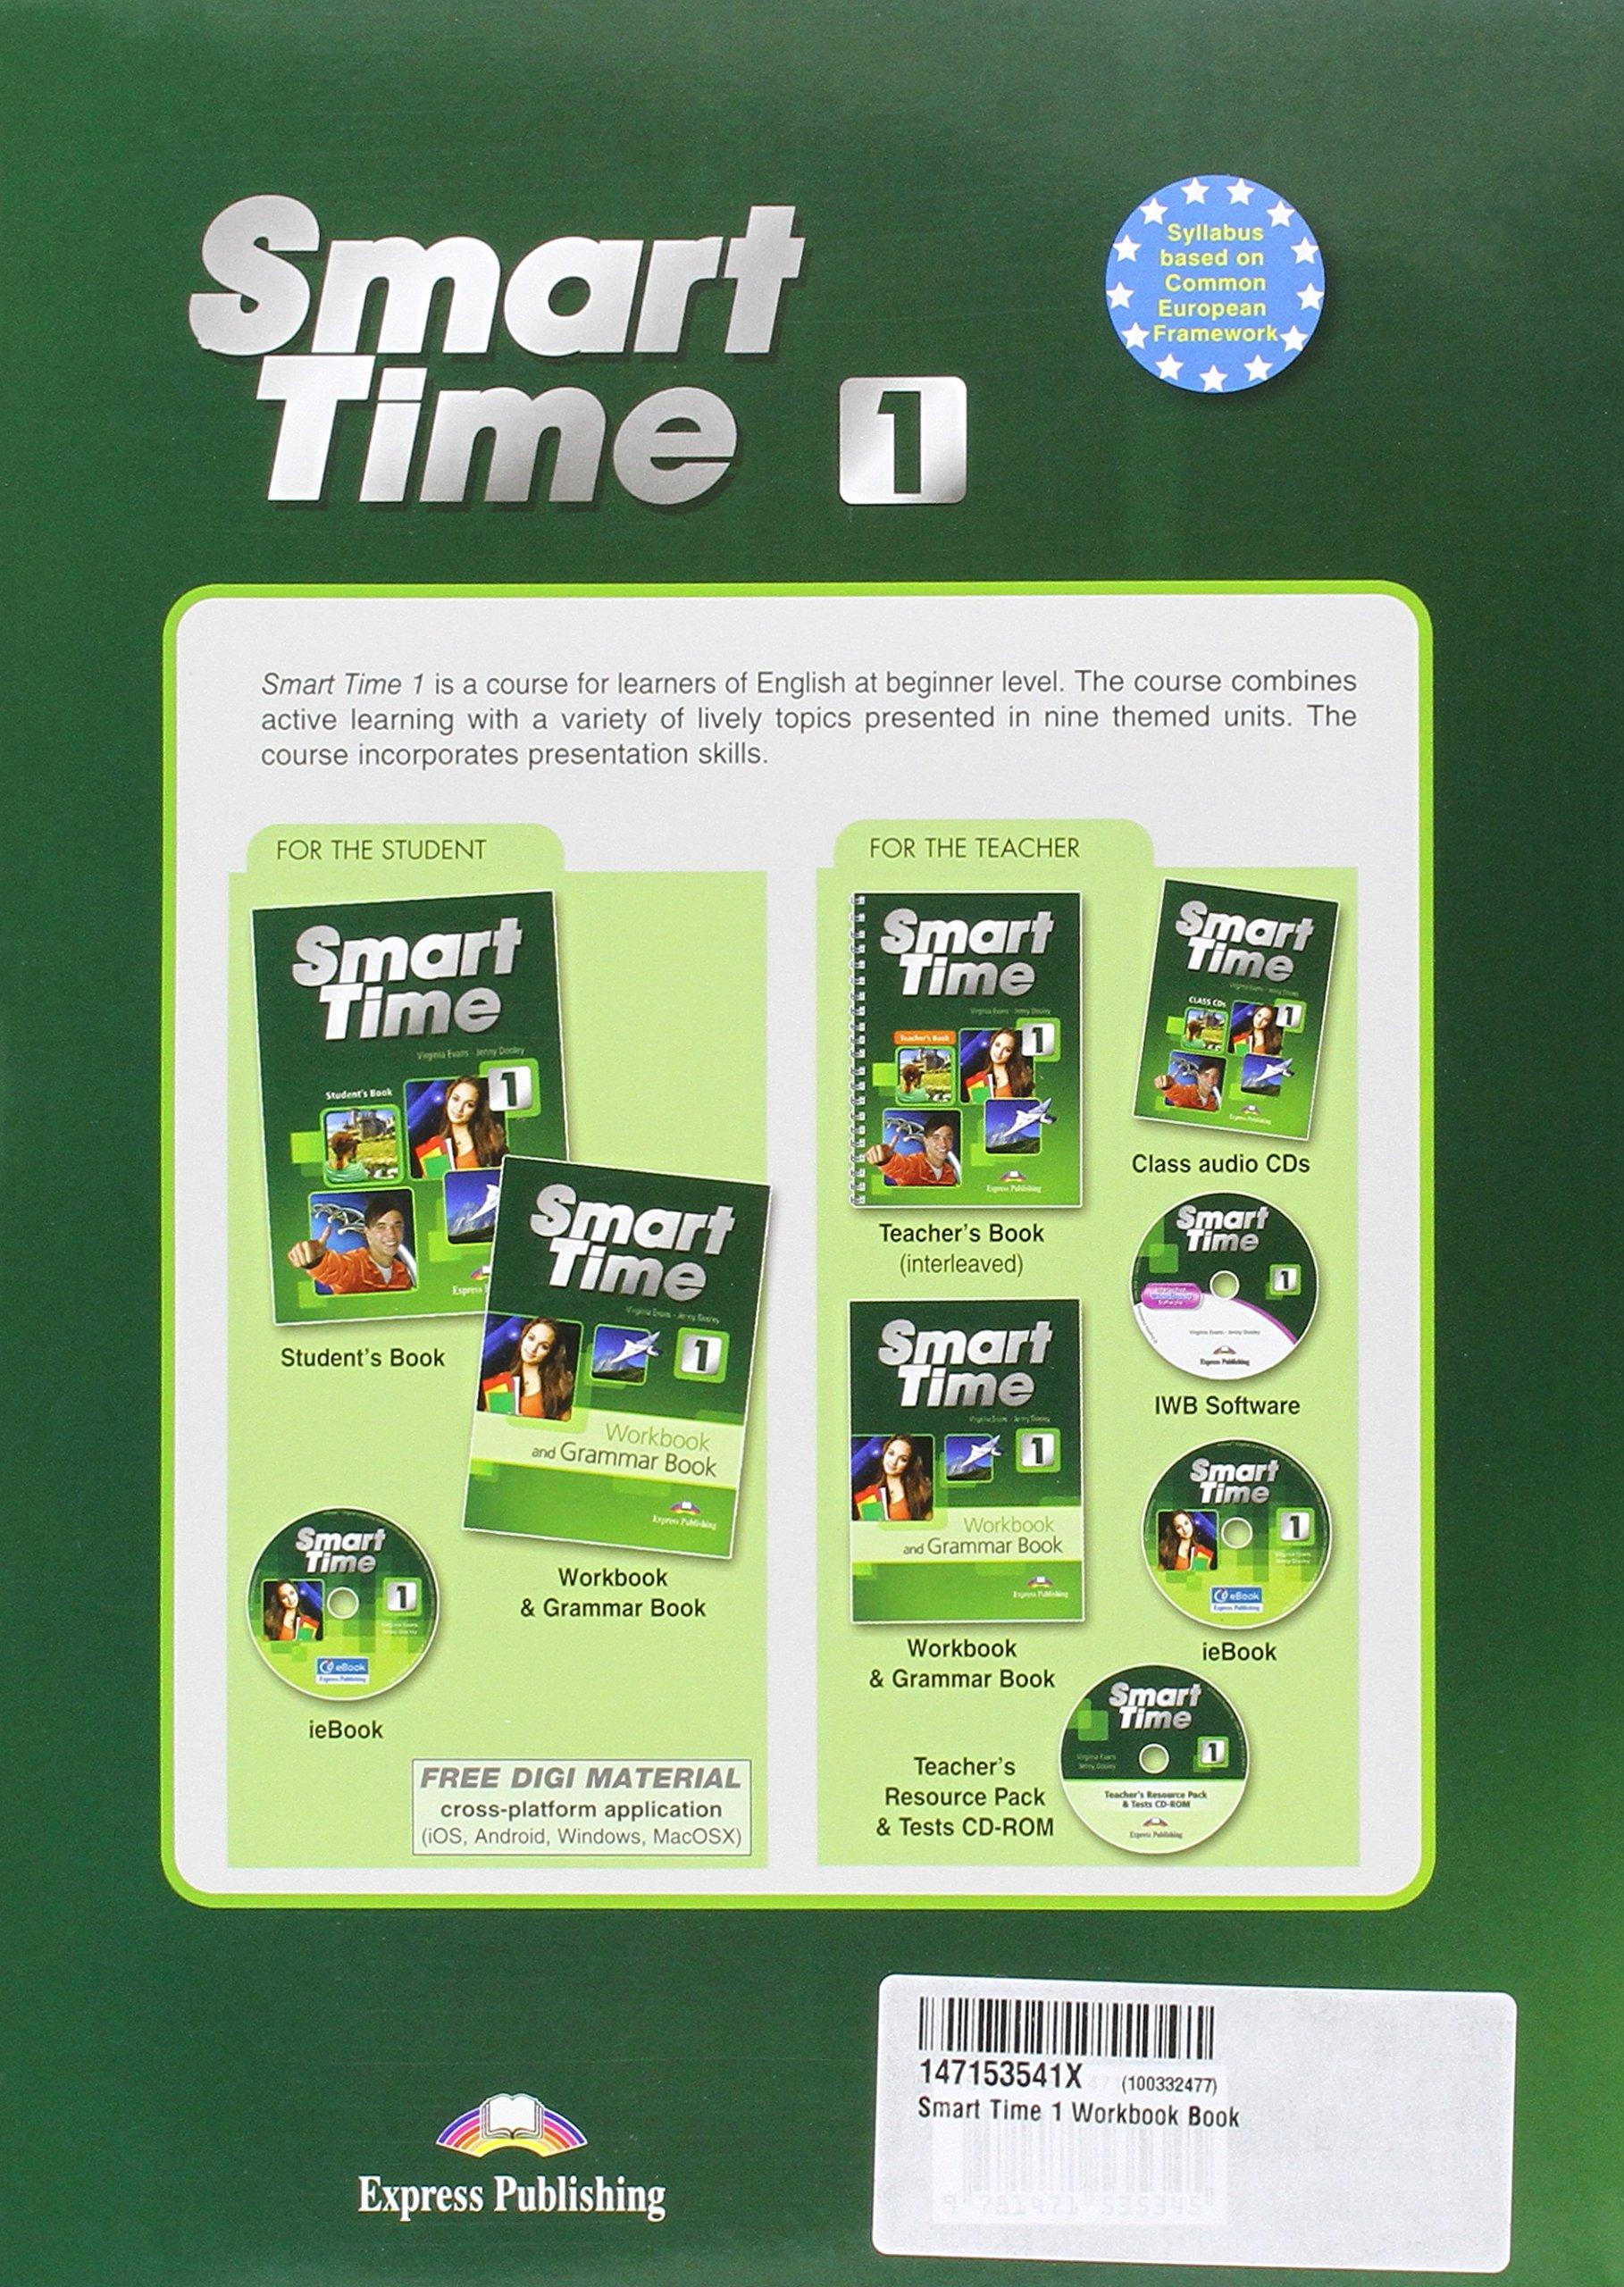 Smart Time 1 Workbook Book: Amazon.es: Express Publishing (obra colectiva): Libros en idiomas extranjeros